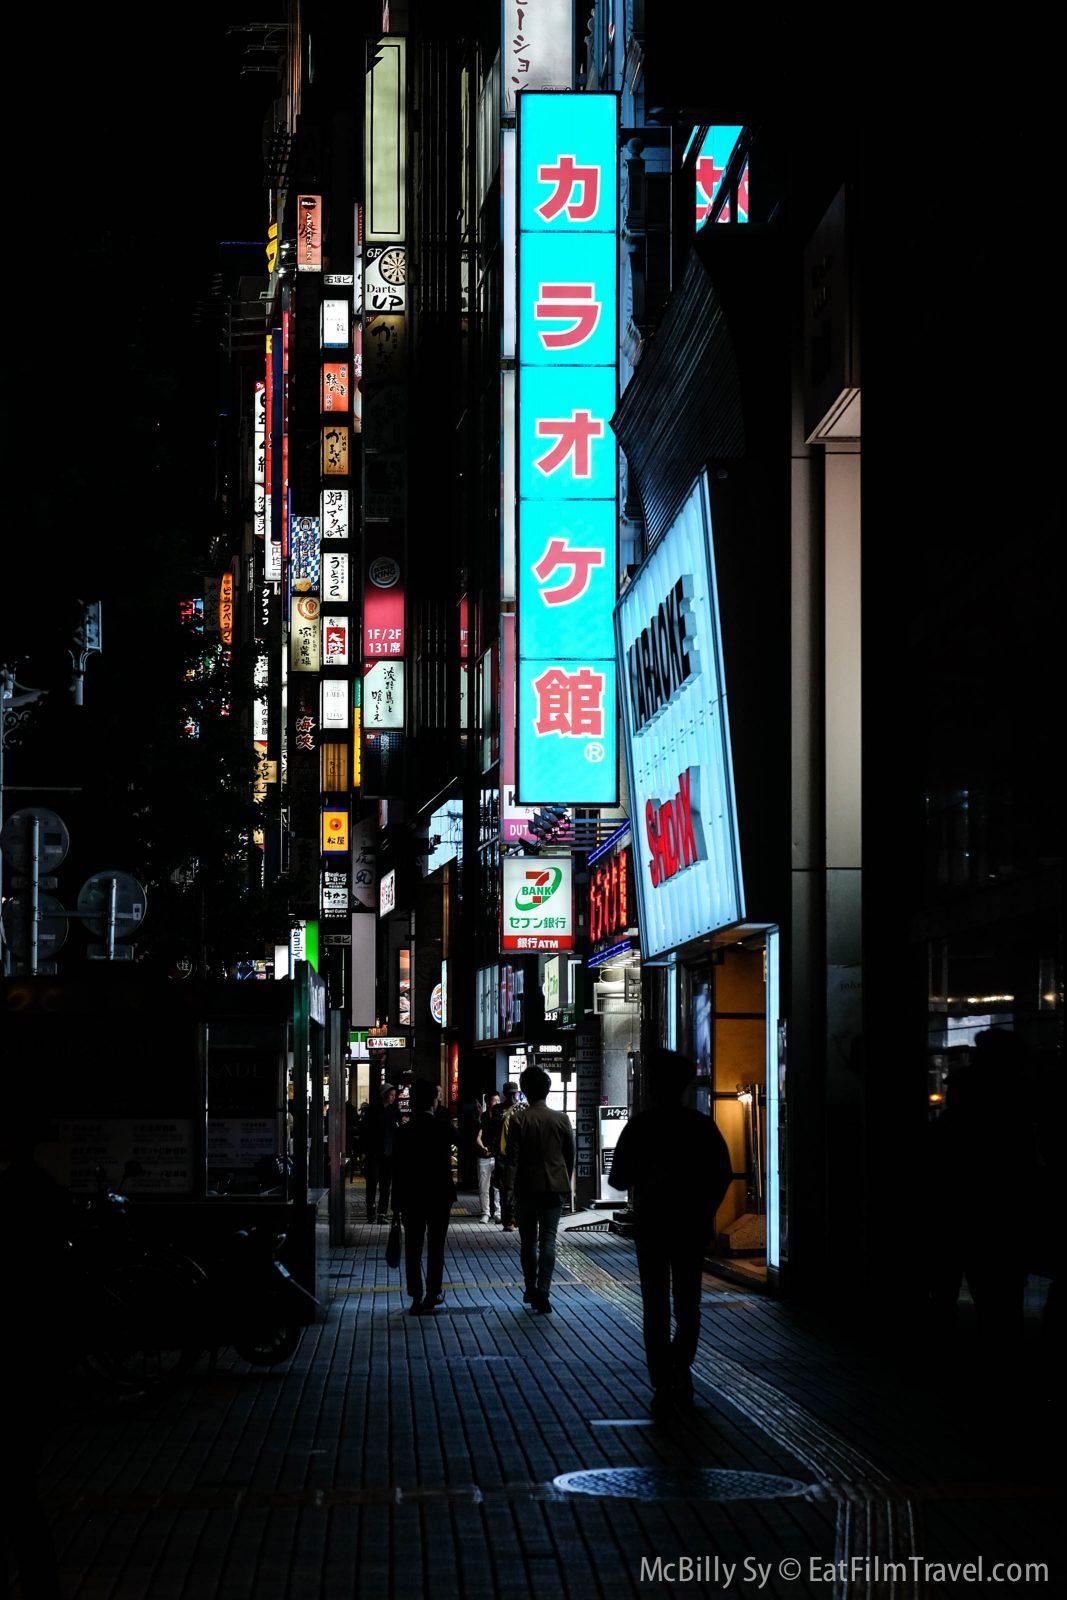 Perfect to walk around the Shinjuku area for some night photography